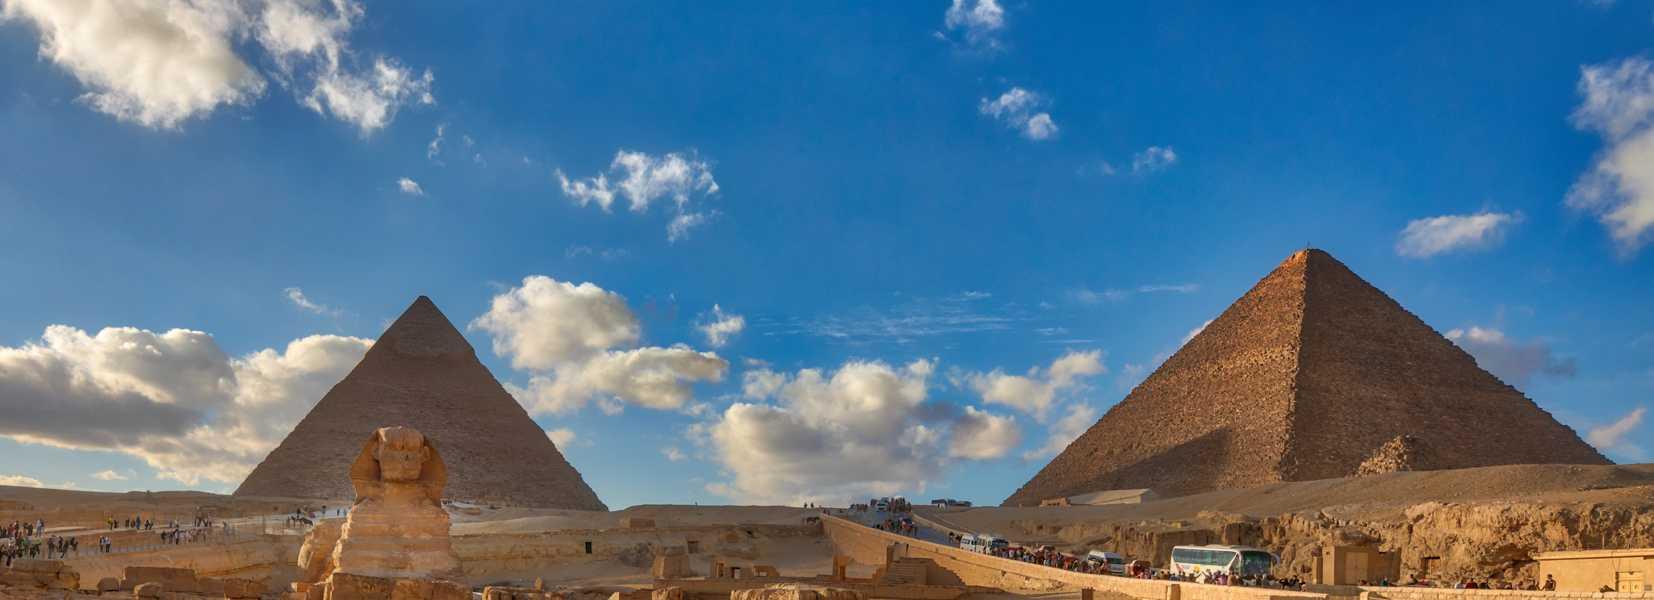 Piramide van Giza - Cairo